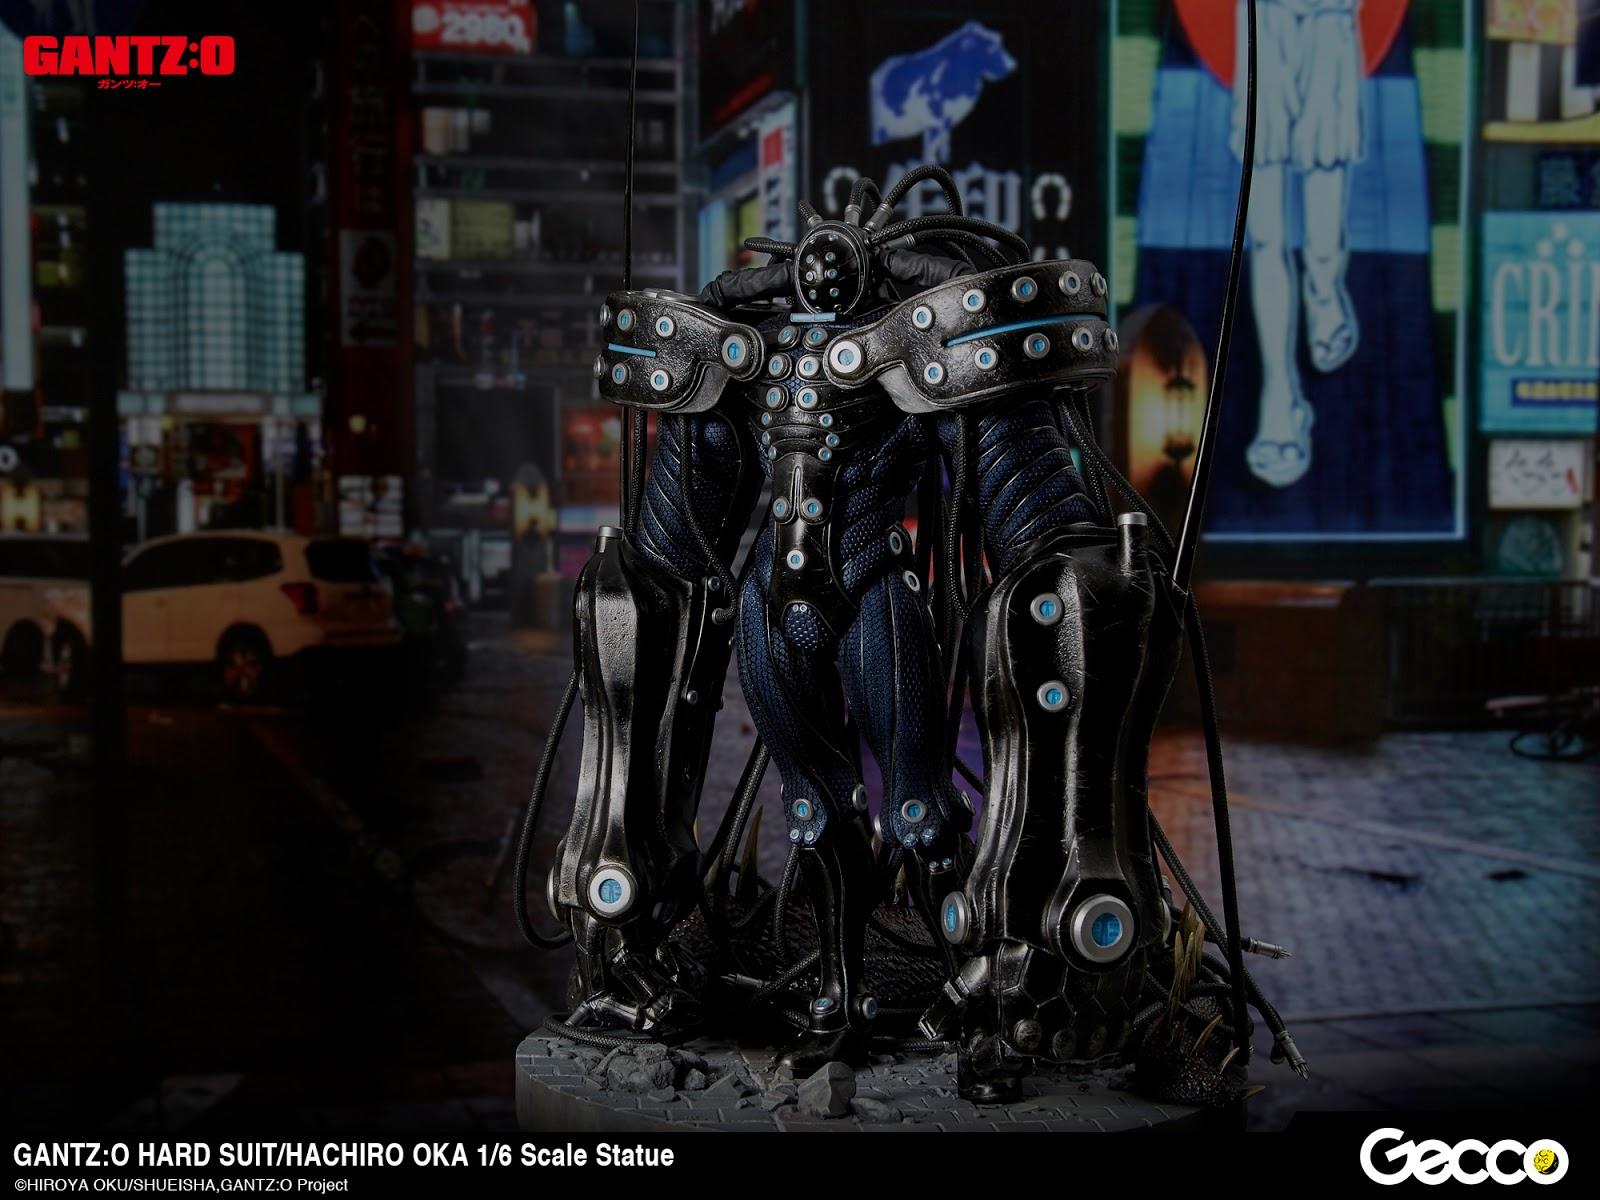 Collecting Toyz Gantzo Hard Suithachiro Oka 16 Scale Statue